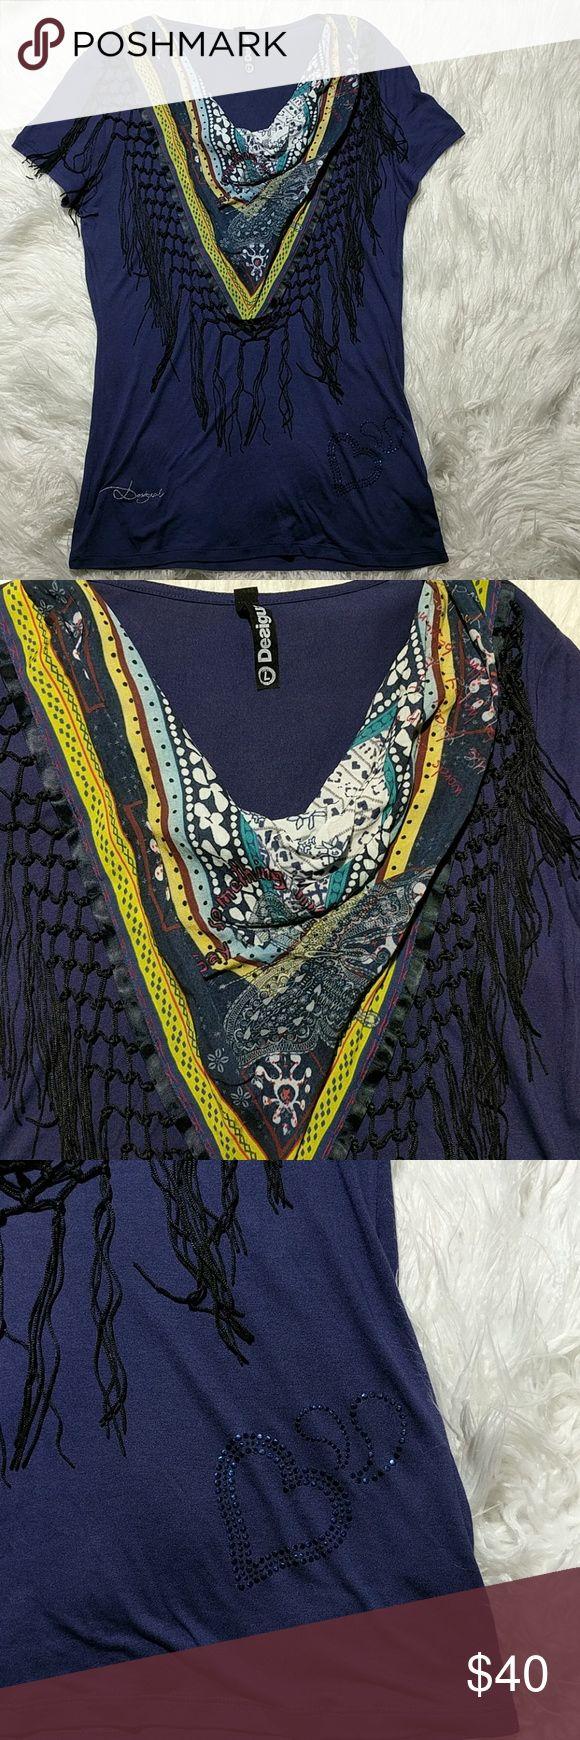 Spotted while shopping on Poshmark: Desigual Top sz Lg! #poshmark #fashion #shopping #style #Desigual #Tops